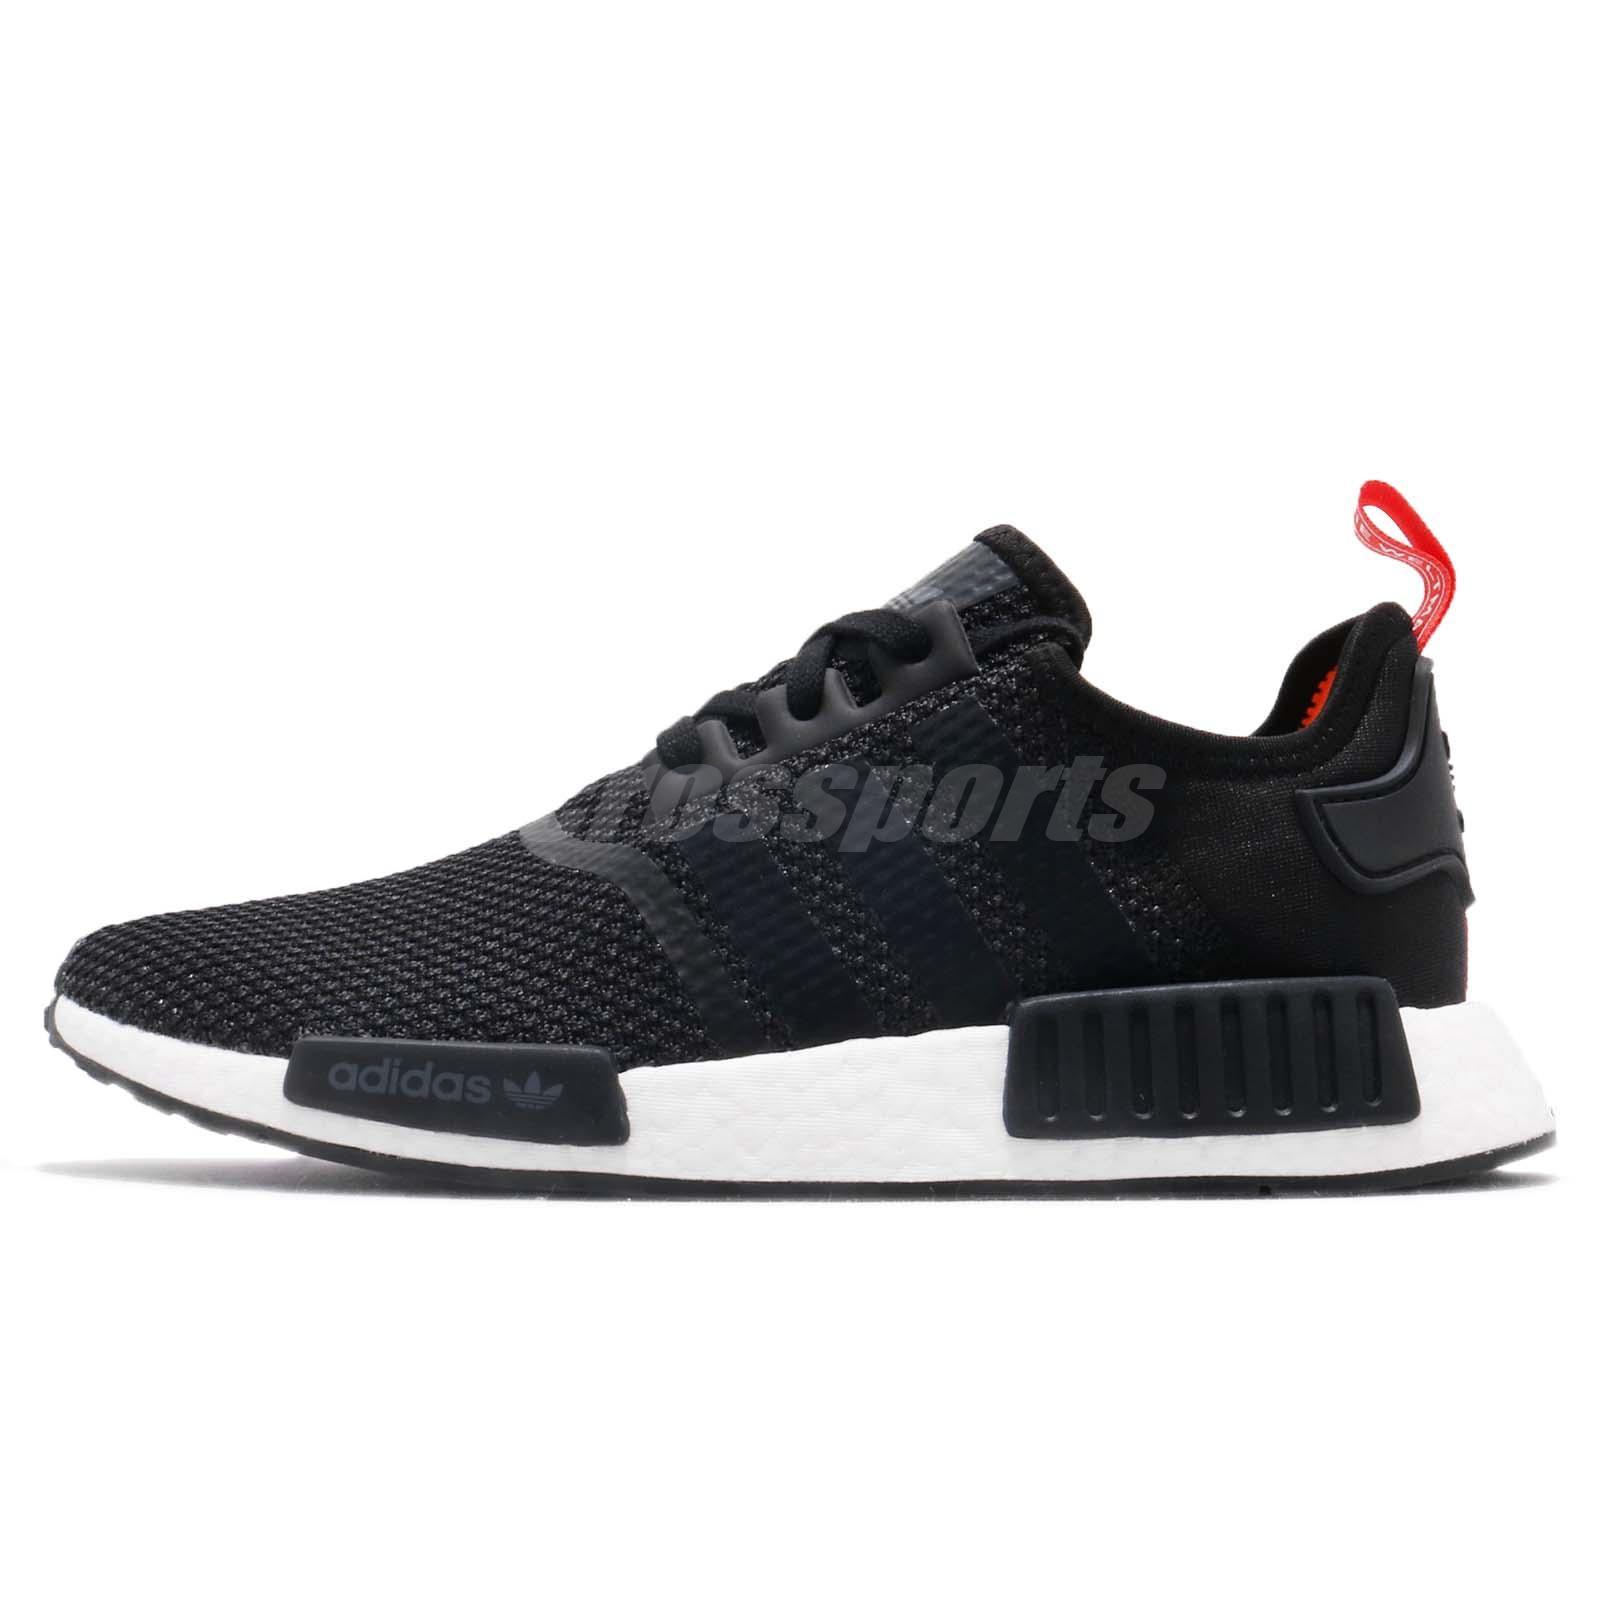 048f4572b Details about adidas Originals NMD R1 Black Solar Orange Men Running Shoes  Sneakers B37621